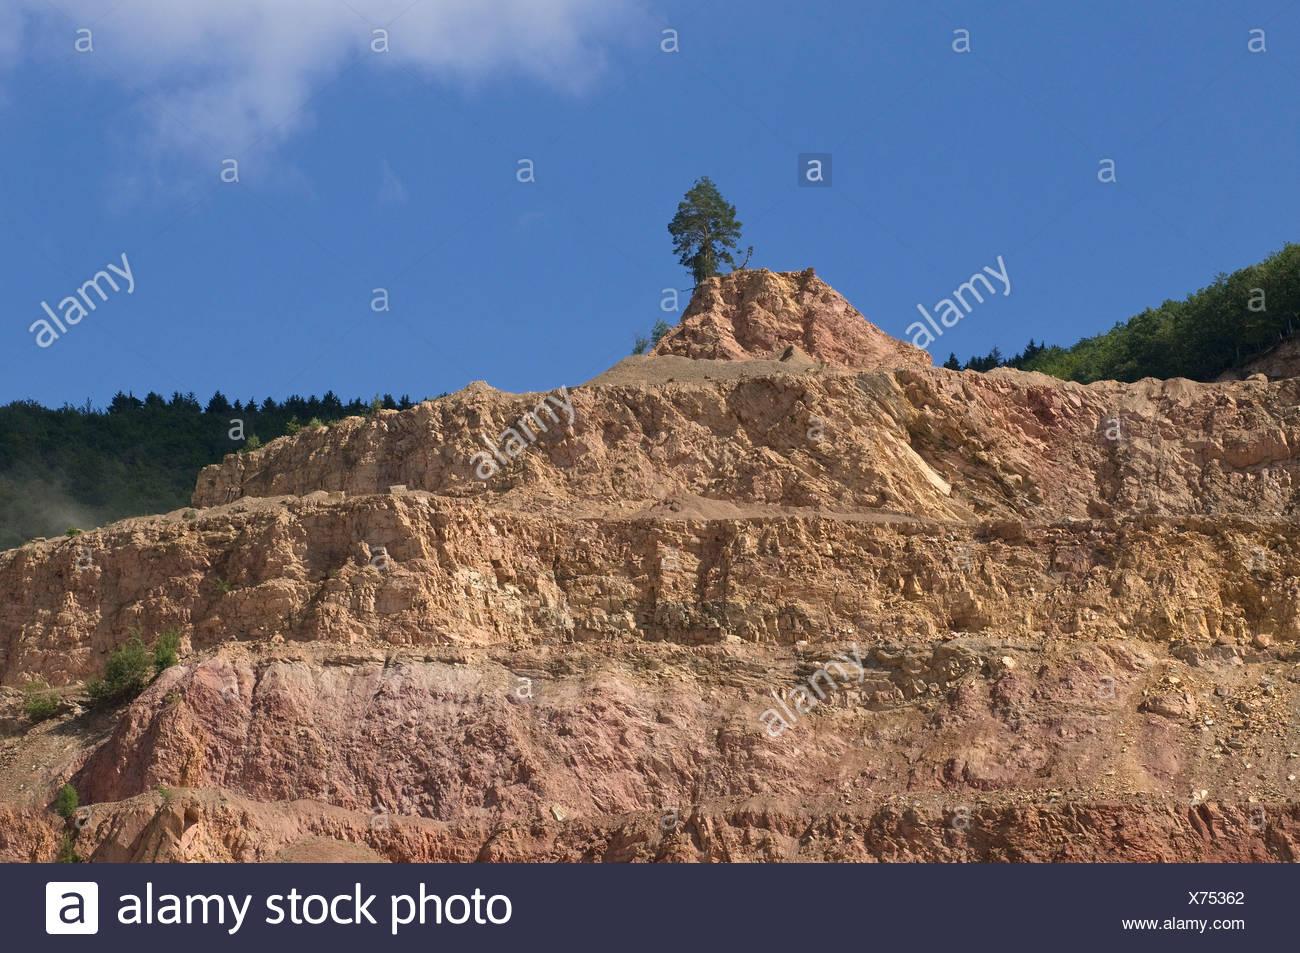 Sandstone, layered quarrying - Stock Image